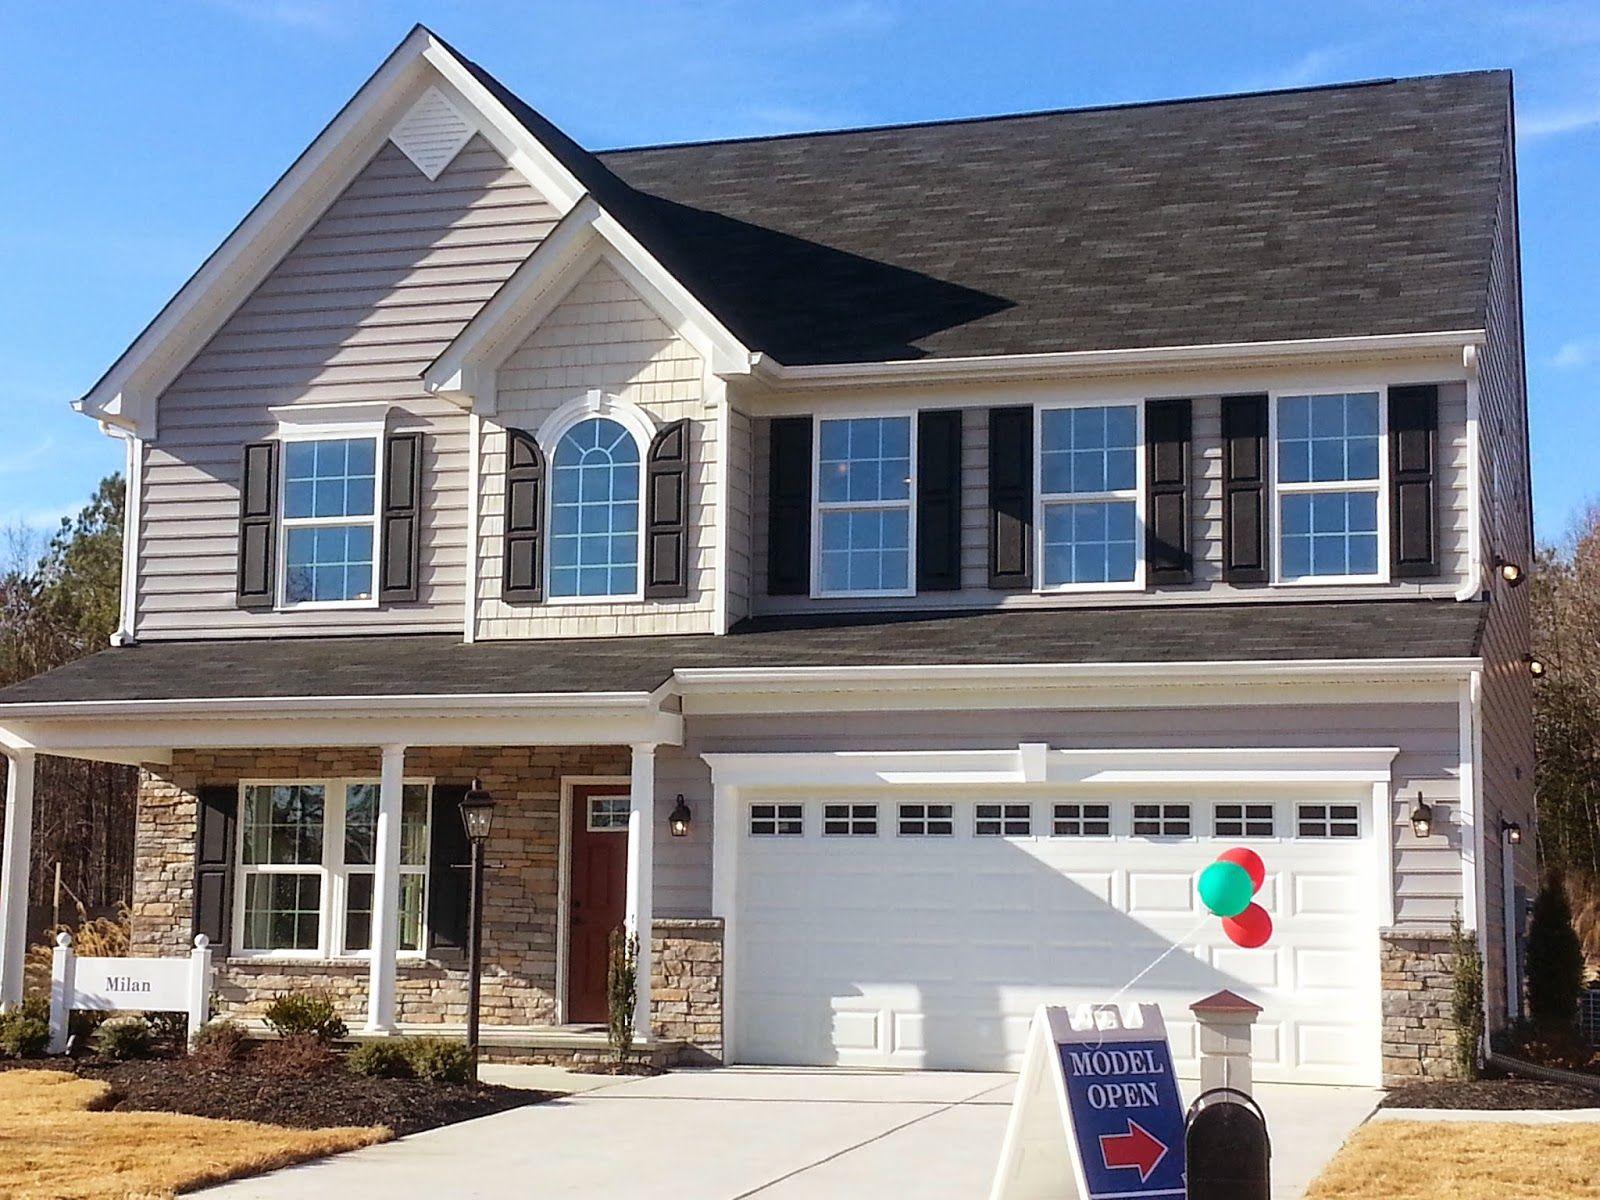 Building Our New Dream Ryan Home - Milan in Richmond, Virginia ...